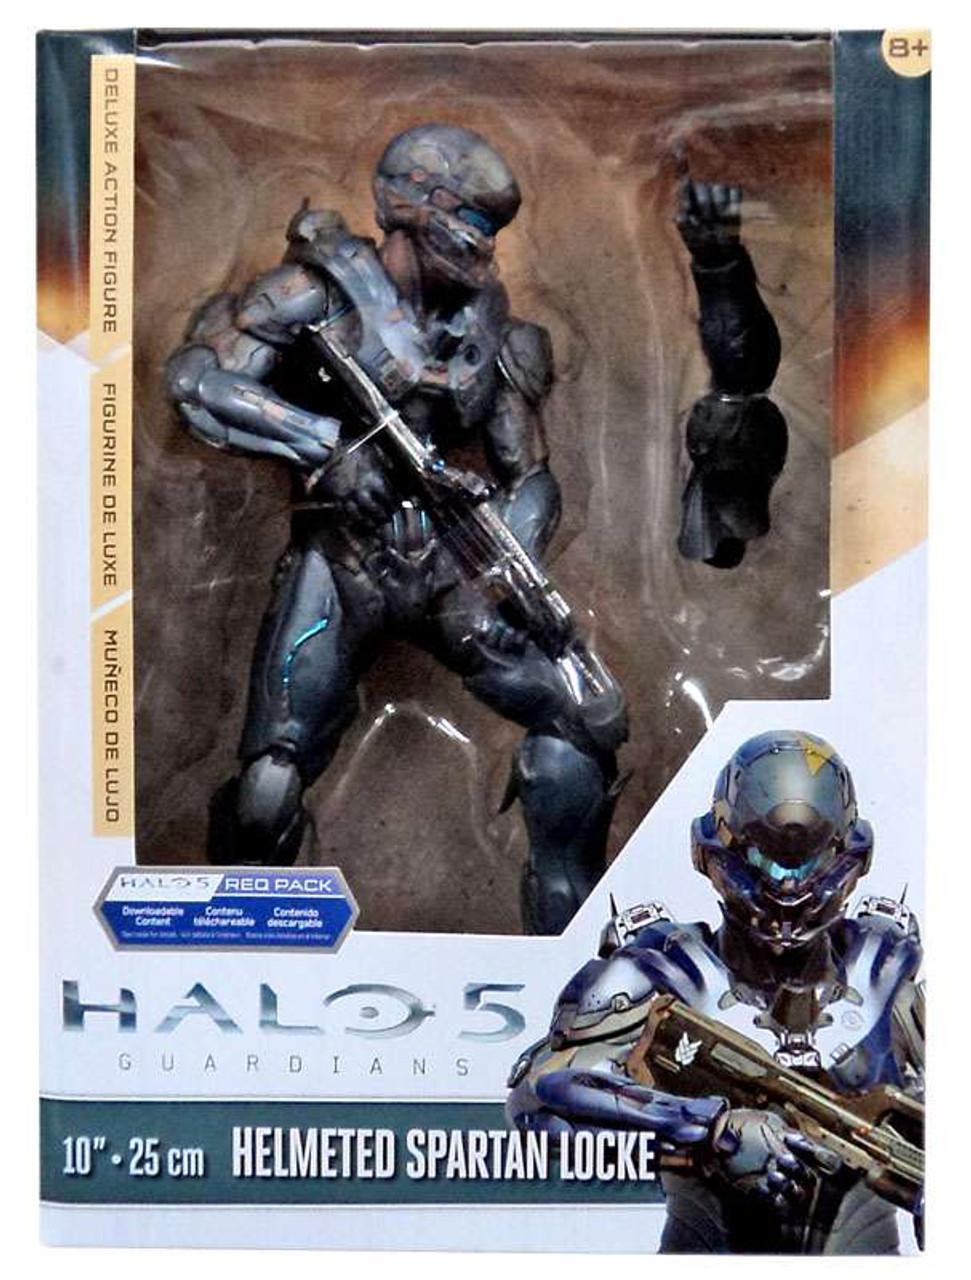 SPARTAN LOCKE Guardians Deluxe Figure Halo 5 McFarlane Toys Action Figure